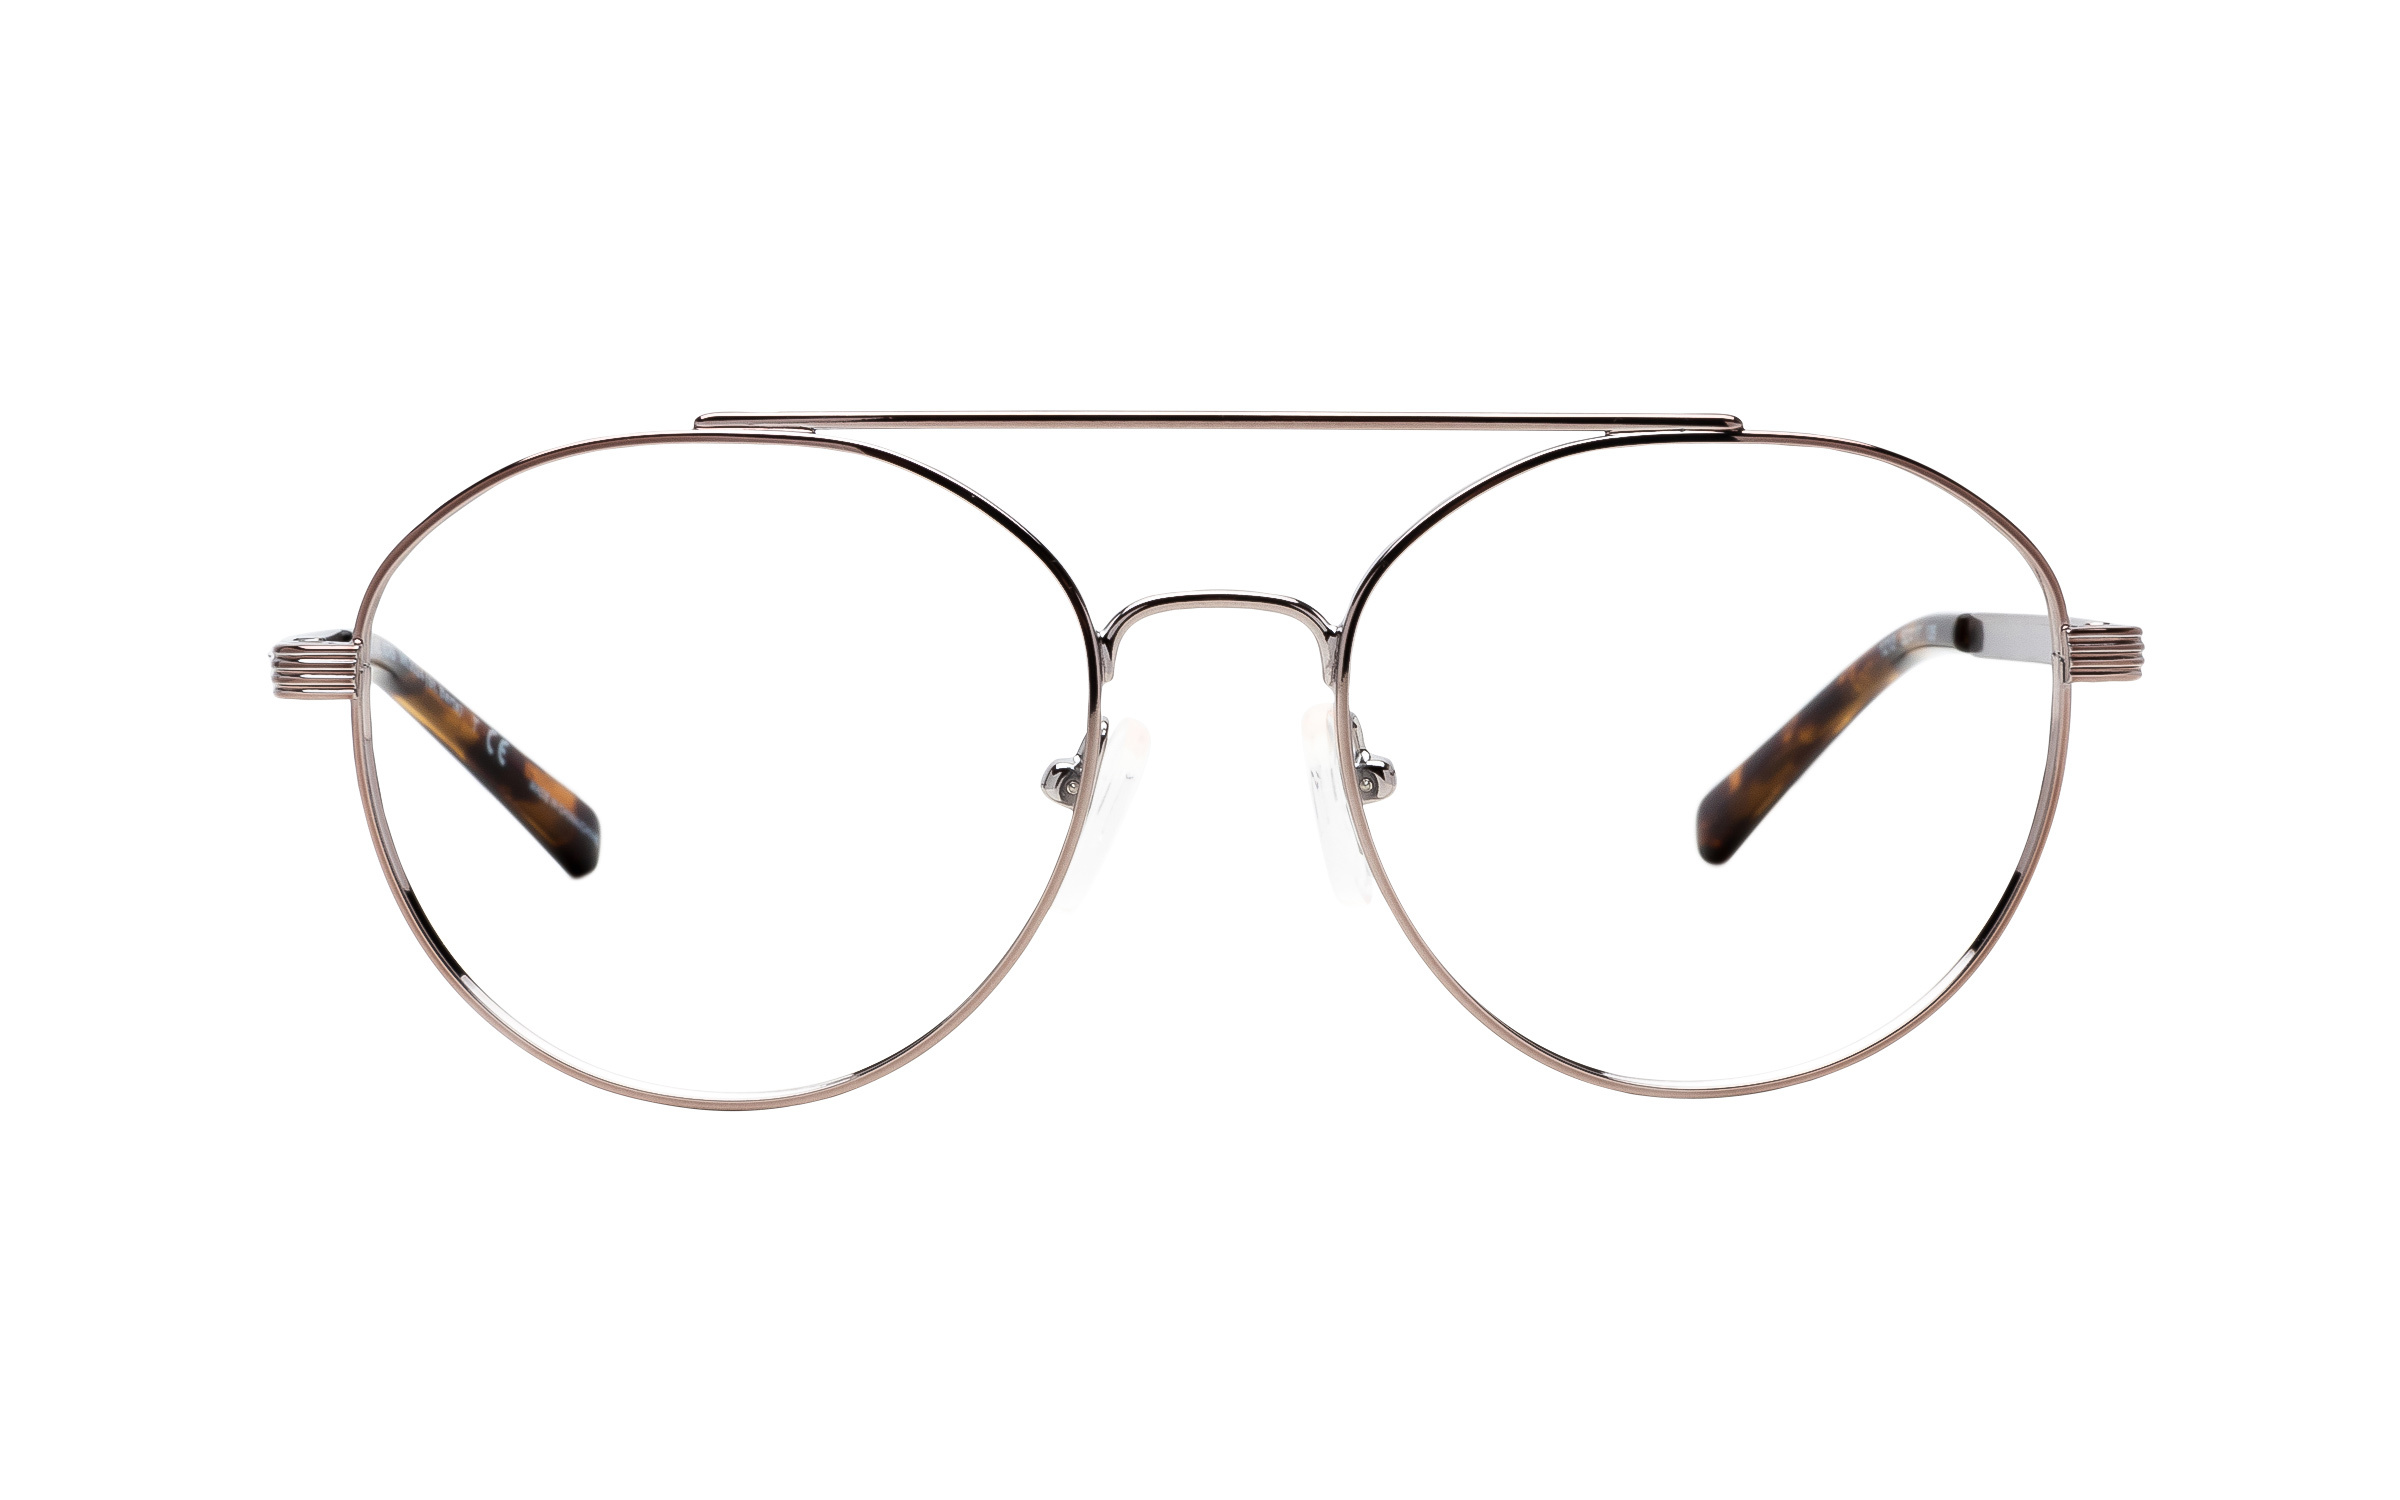 Michael Kors St. Barts MK3024 1213 (52) Eyeglasses and Frame in Sable Silver | Metal - Online Coastal